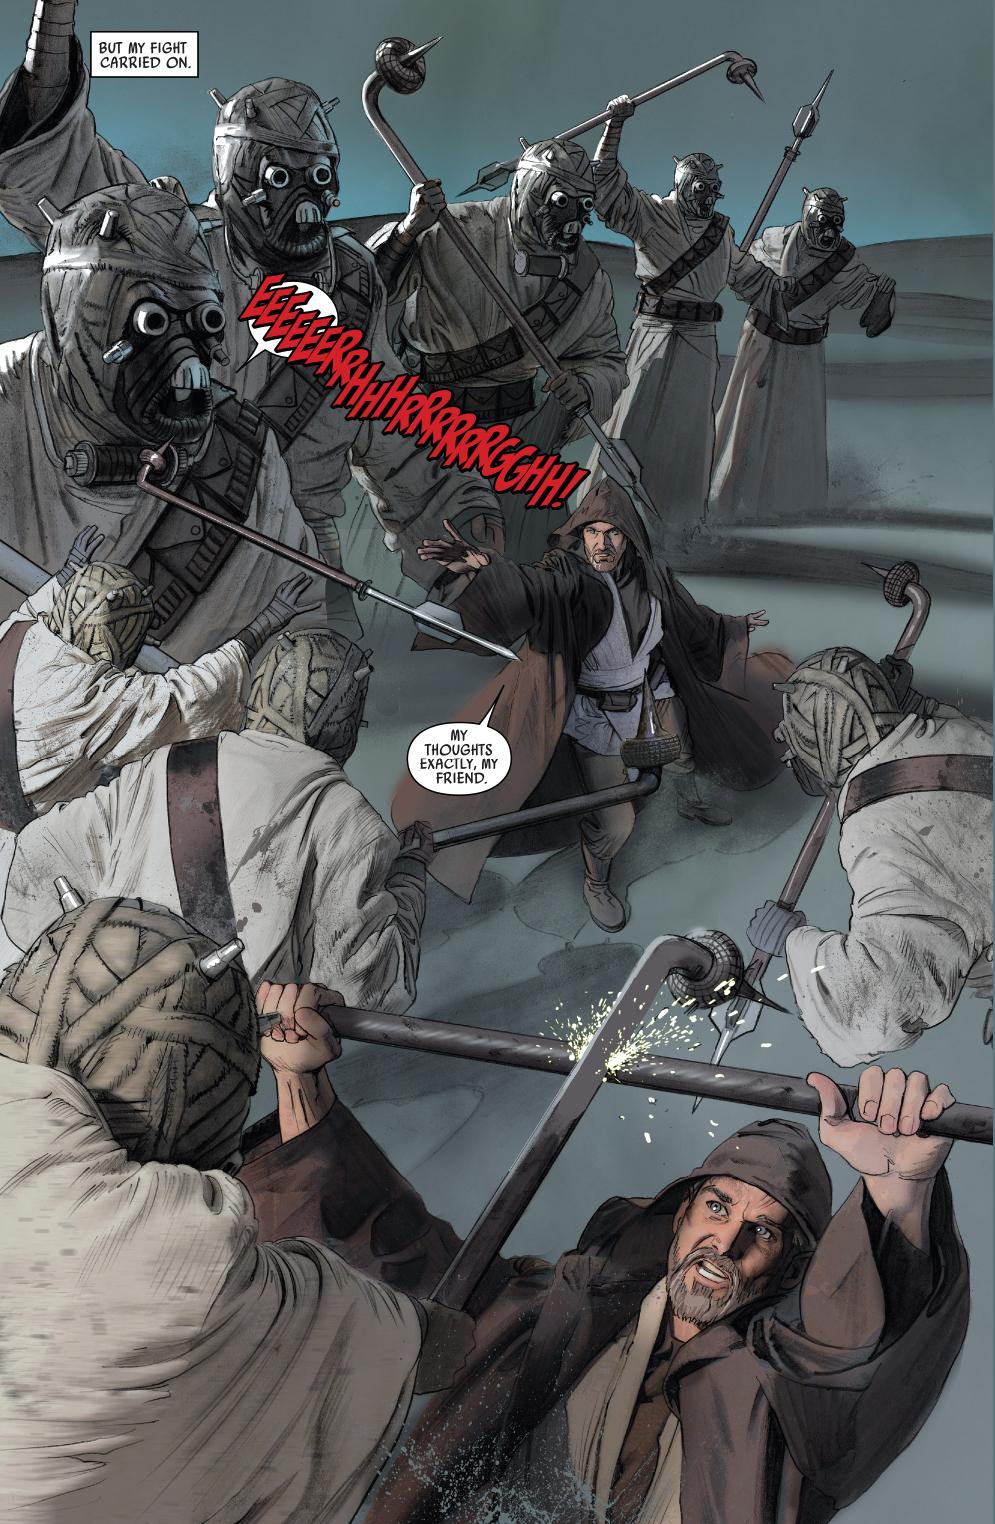 Obi Wan Kenobi Vs Tusken Raiders Comicnewbies